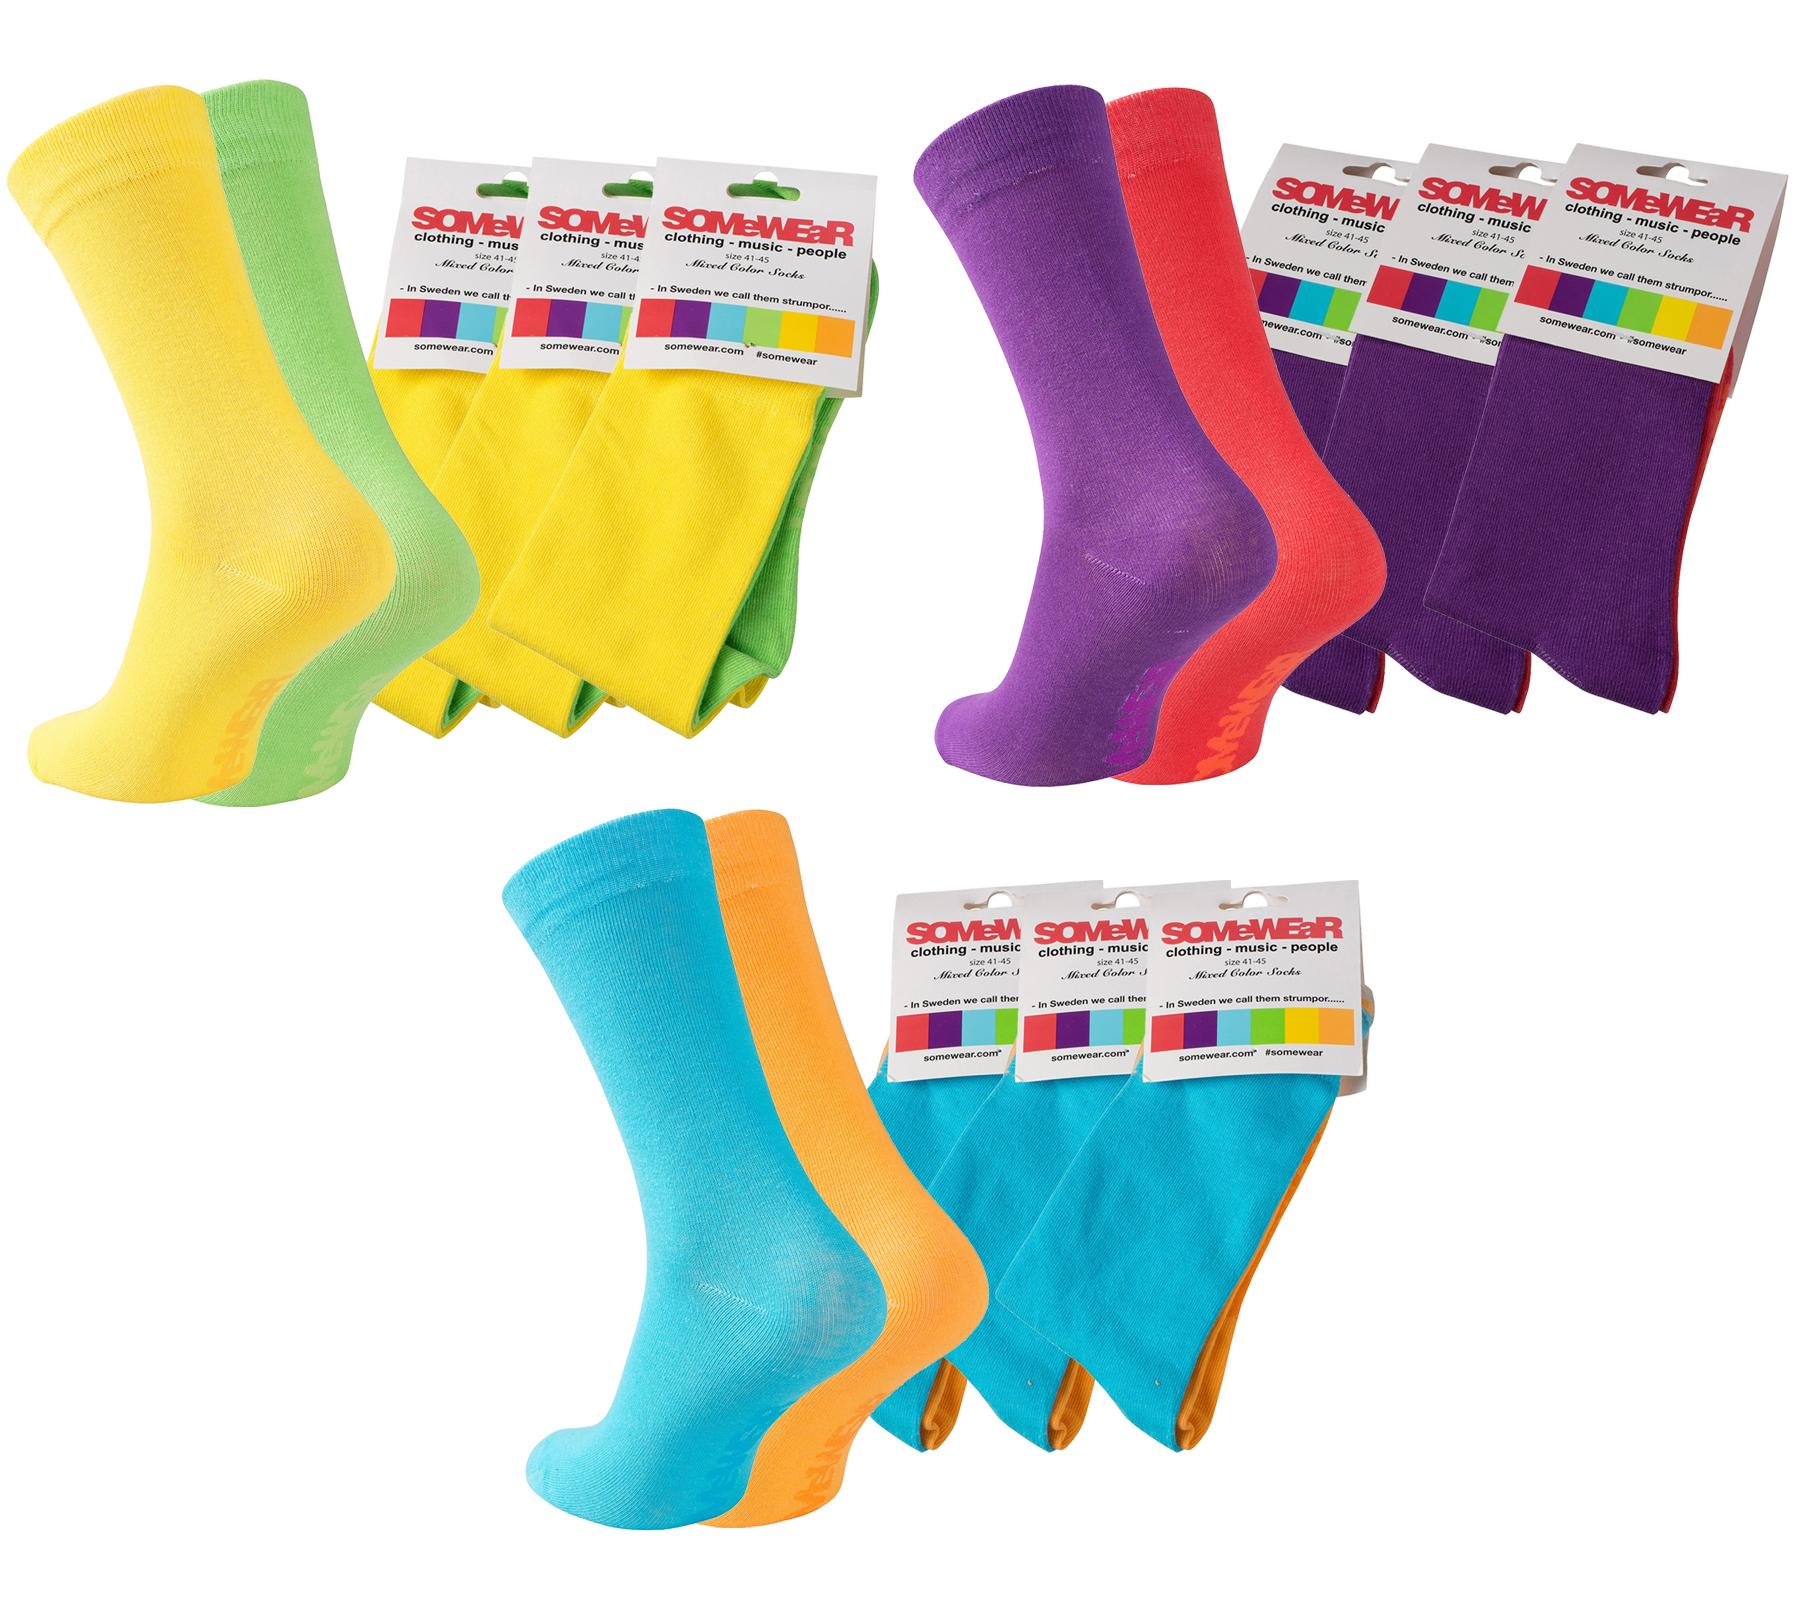 30 Paar bunte Socken (Gr.41-45) oder 10x Boxershorts (Restgrößen) je 19,90